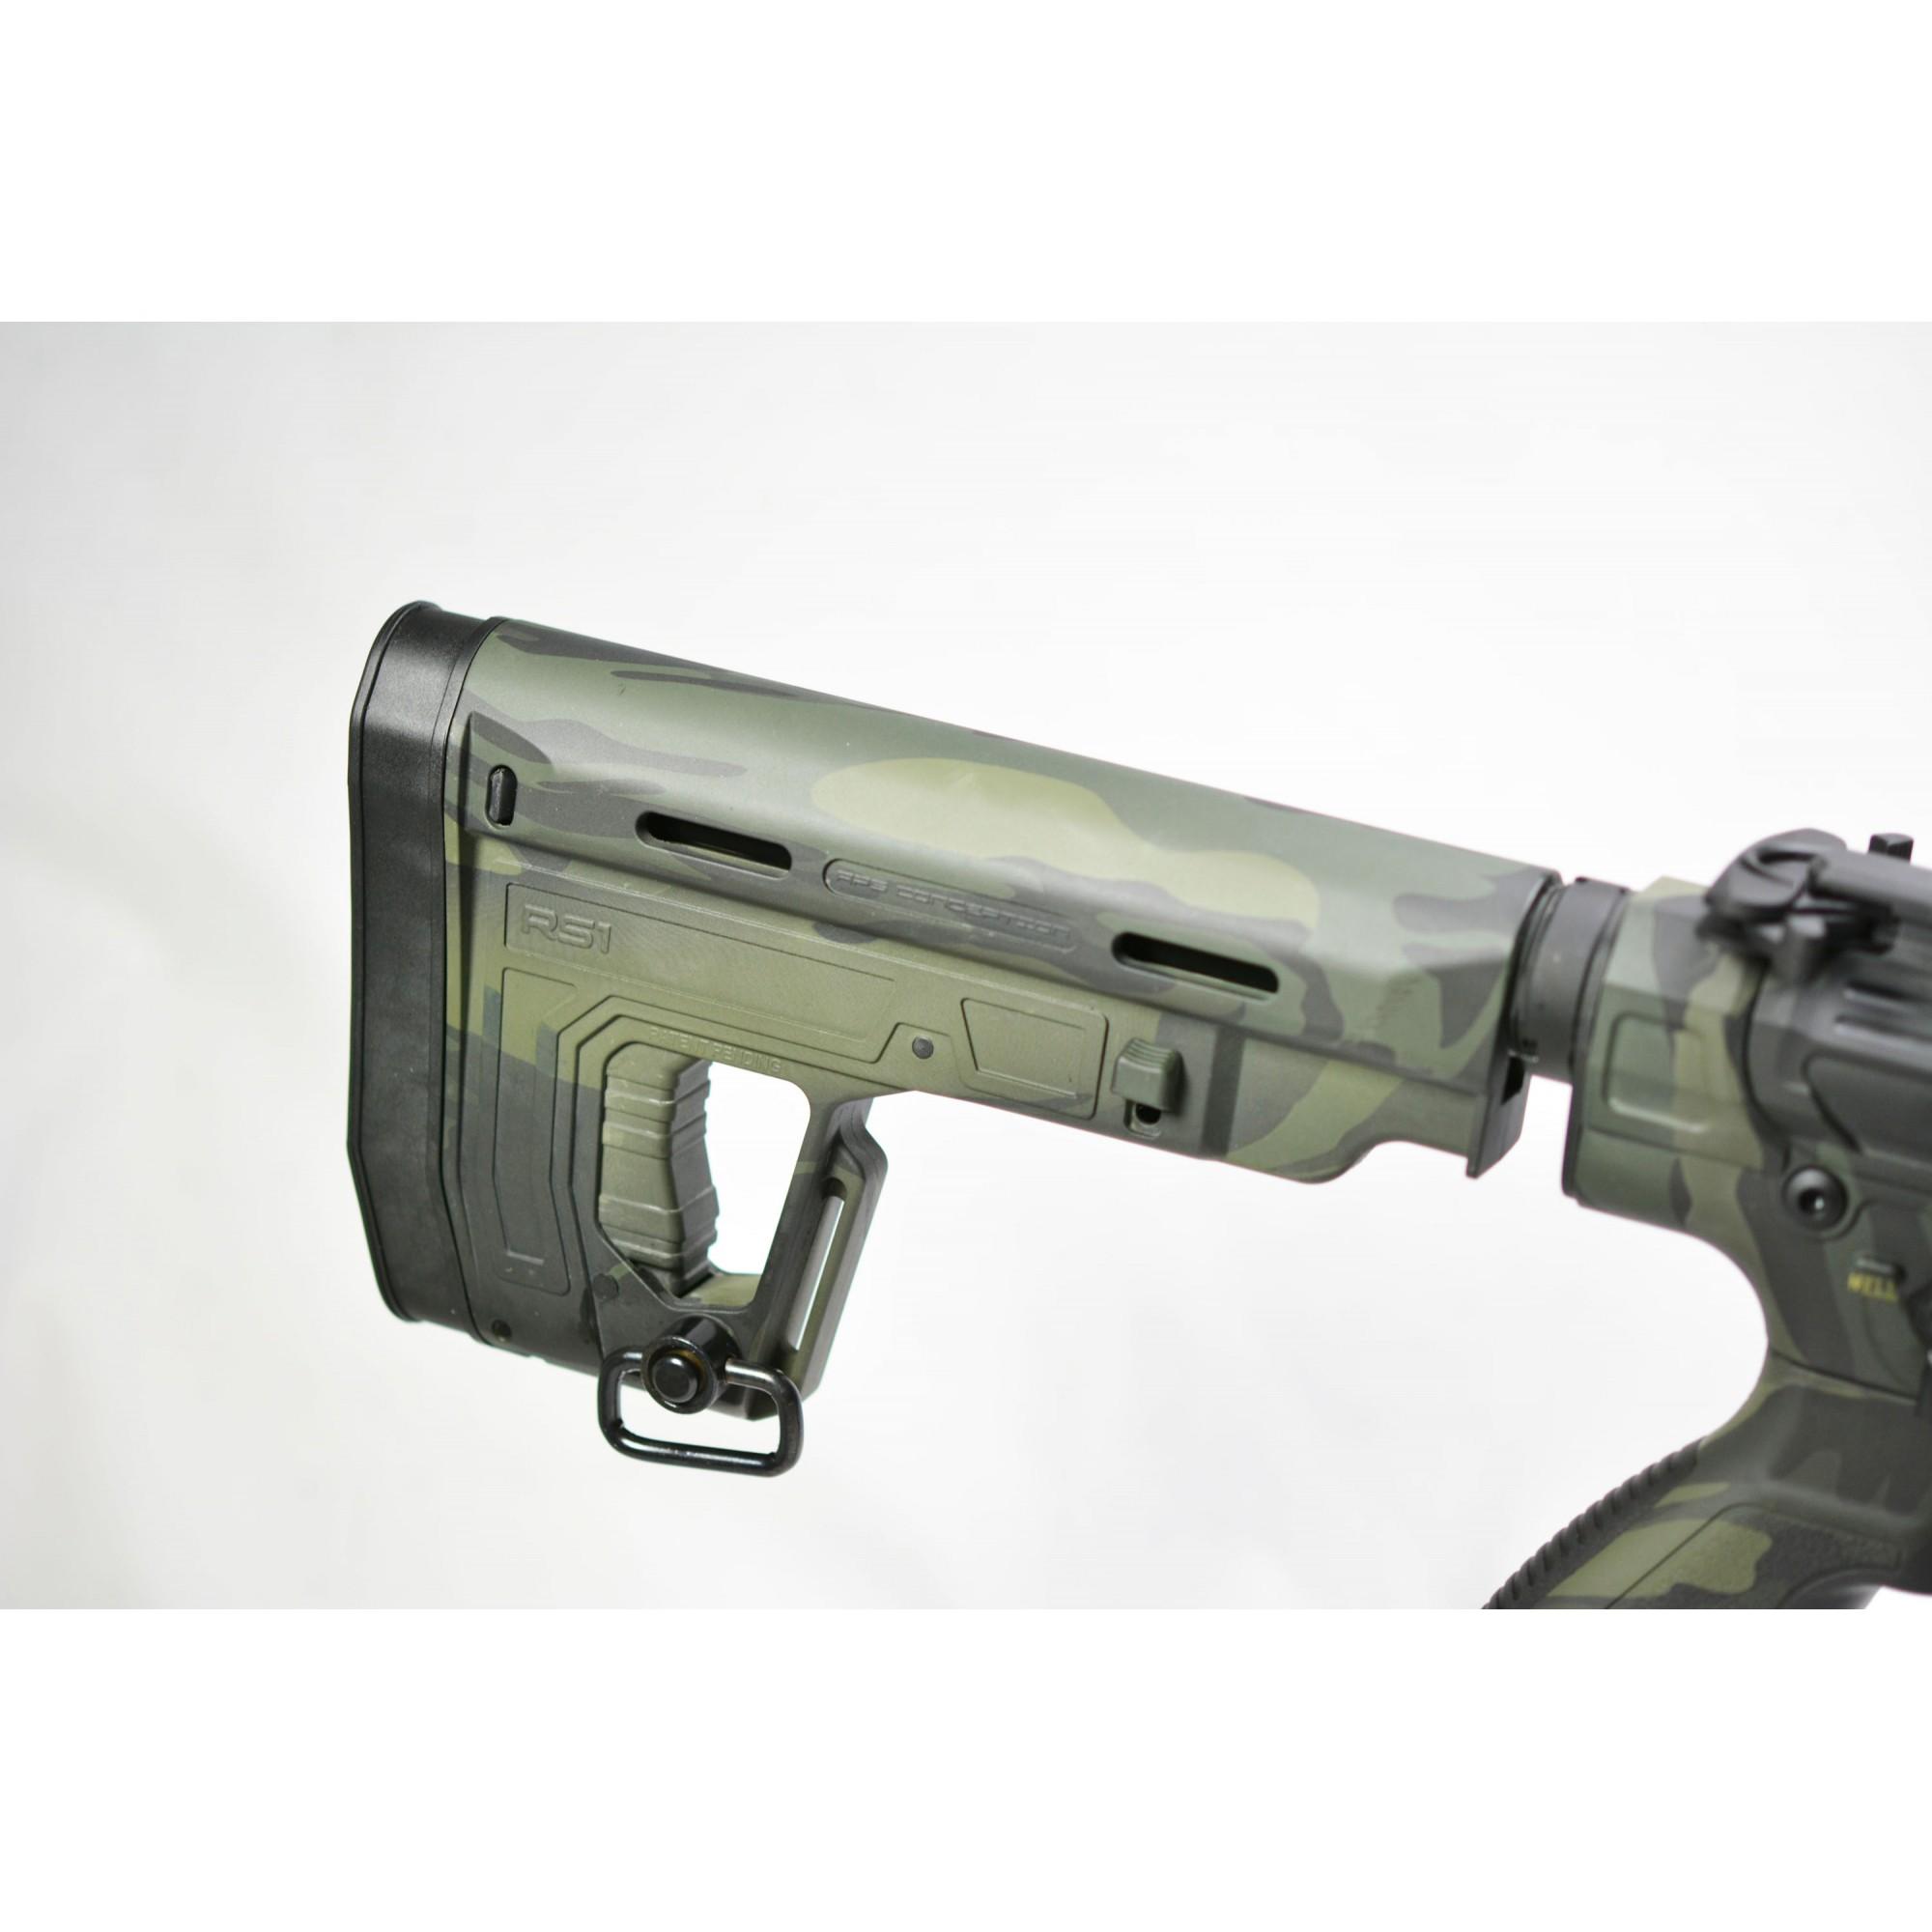 RIFLE DE AIRSOFT AEG M4 PHANTOM EXTREMIS RIFLES BK MULTI-CAM 12.5 FULL METAL BLOWBACK PER702BKMC MKII - APS